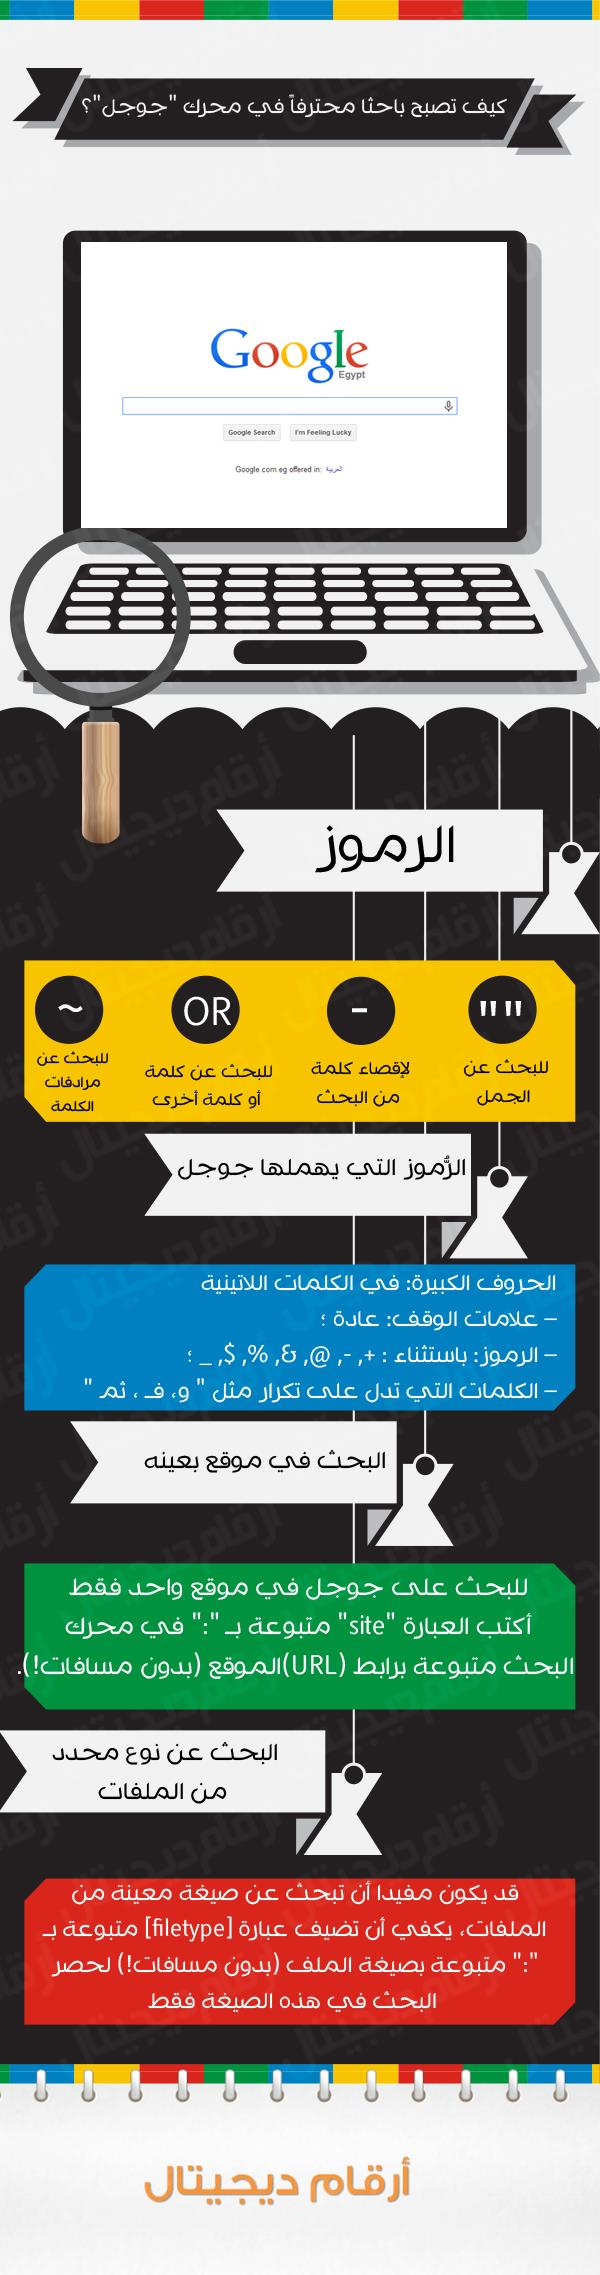 Pin By Miim Al Harthi On Arabic Infografic إنفوجرافيك بالعربي Learning Websites Learning English Is Fun Social Media Marketing Business